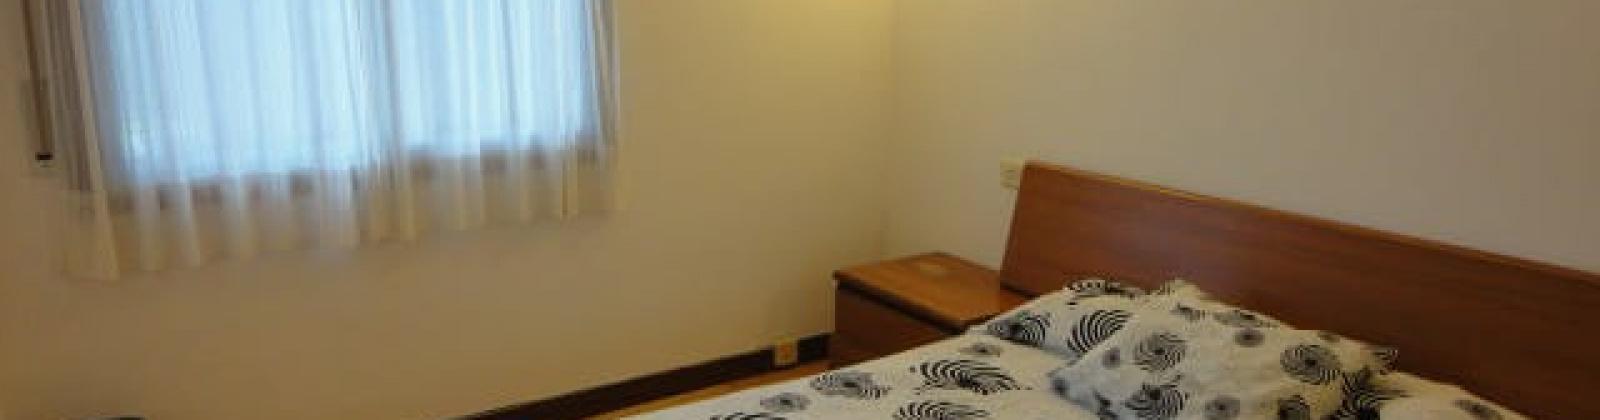 55 MARRUTXIPI 2ºA, DONOSTIA, 20014, 3 Habitaciones Habitaciones, ,2 BathroomsBathrooms,Planta intermedia,En venta,1980,MARRUTXIPI,2,1045